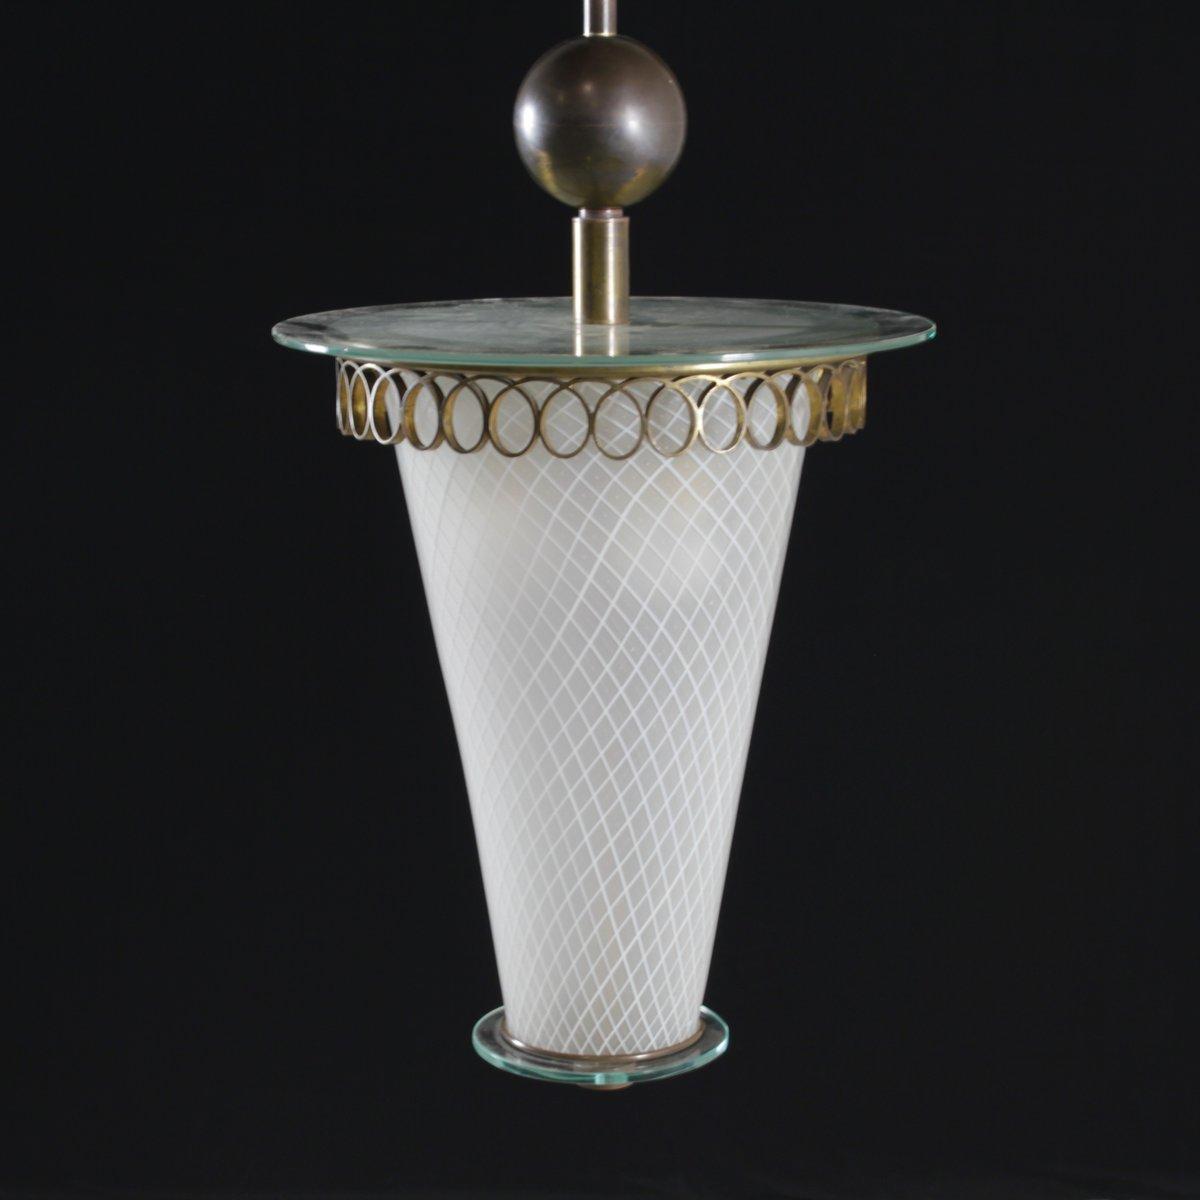 Messing Lampe Vintage